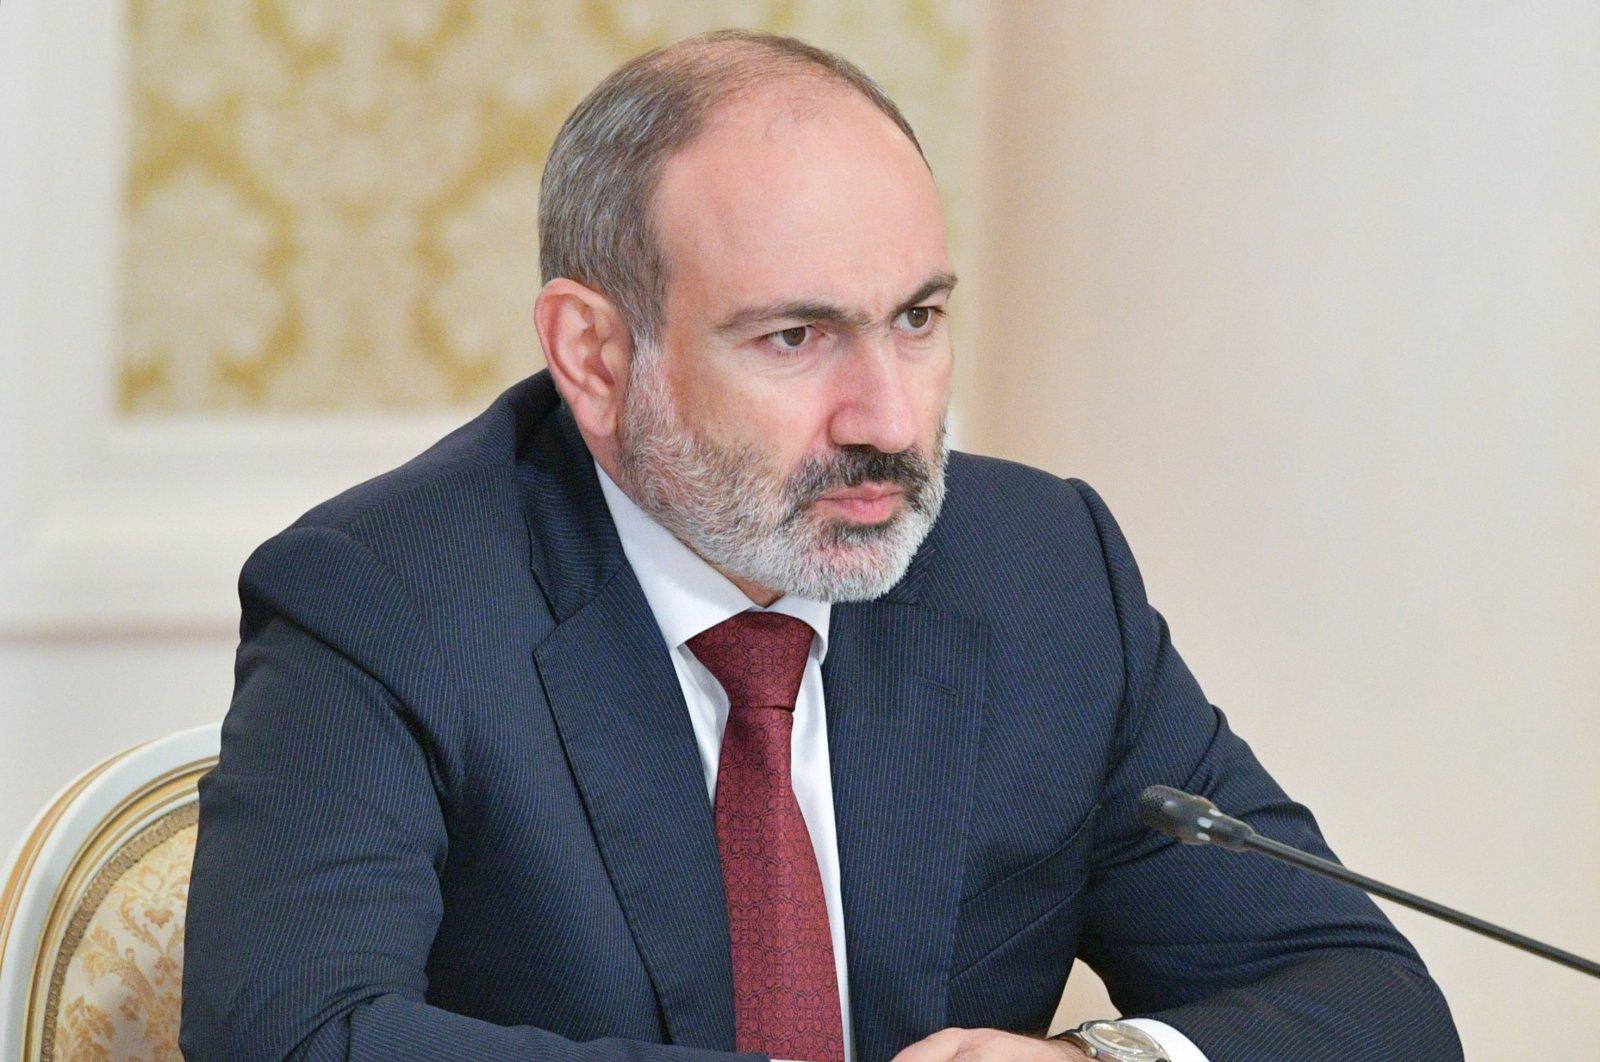 Armenian Prime Minister Nikol Pashinian attends a meeting in Kazan, Russia, 29 April 2021. (EPA Photo)